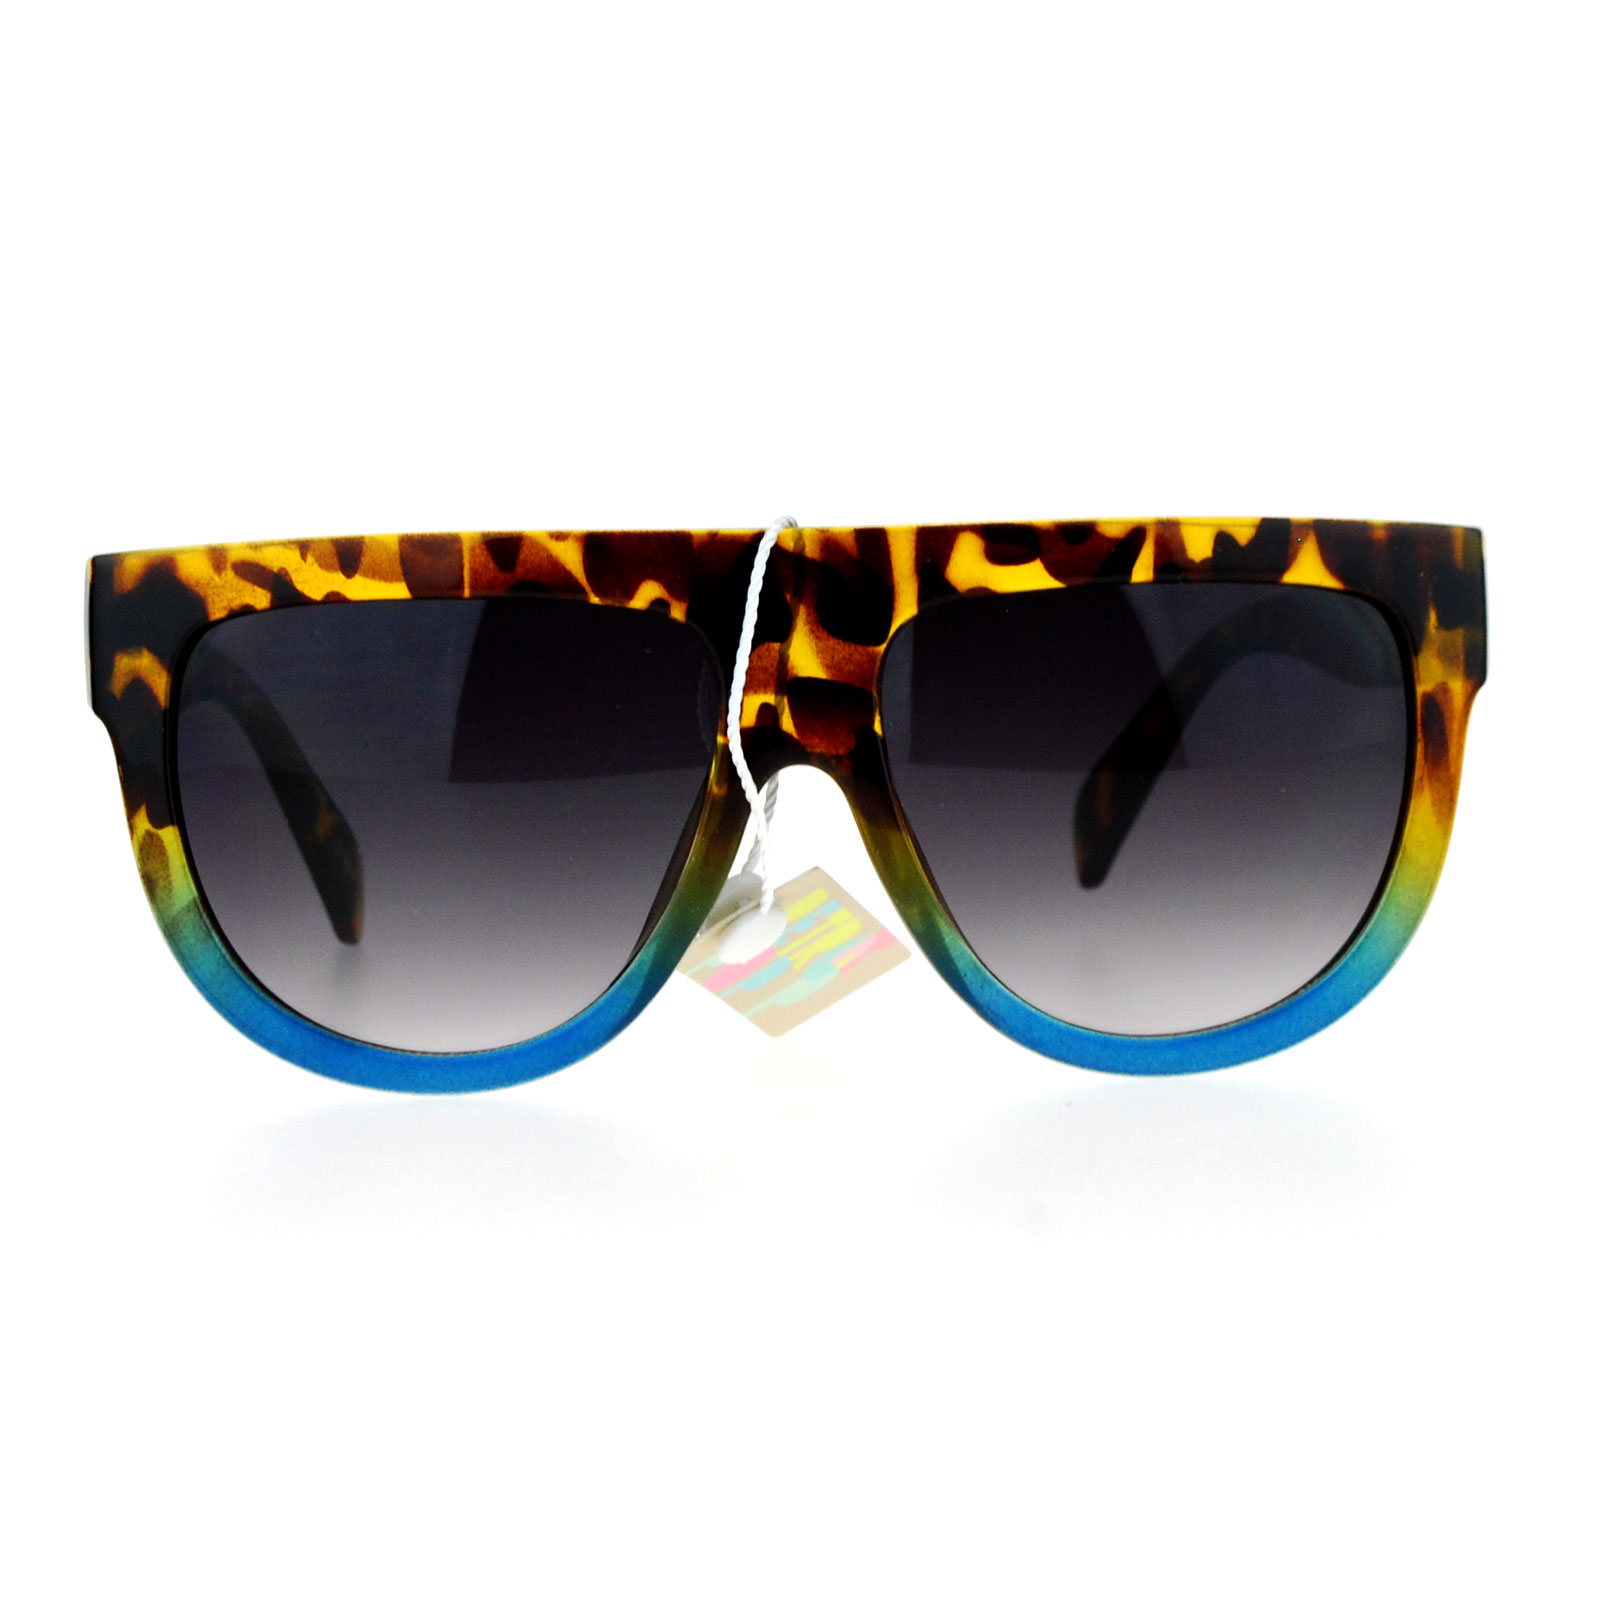 Large womens fashion oversized round circle sunglasses ebay - Sa106 Flat Top Mob Plastic Aviator Womens Sunglasses Ebay